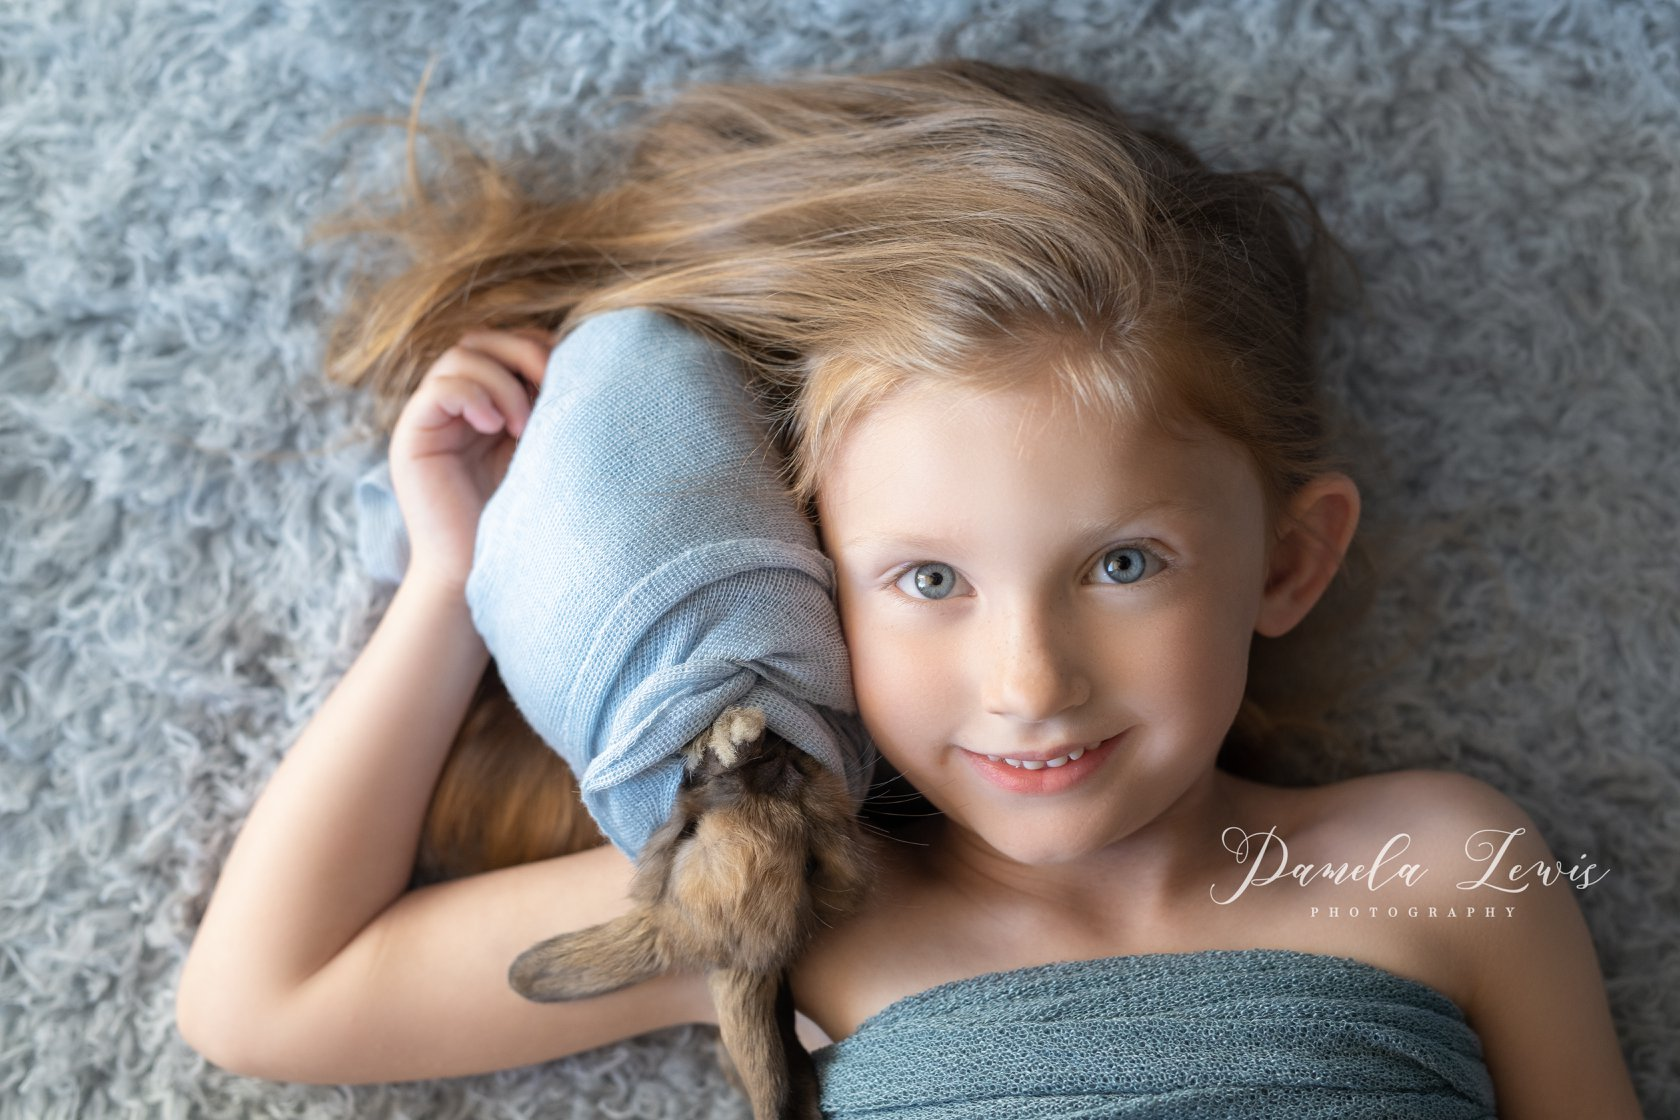 french-blue-faukati-toddler-bunny-pamela-lewis